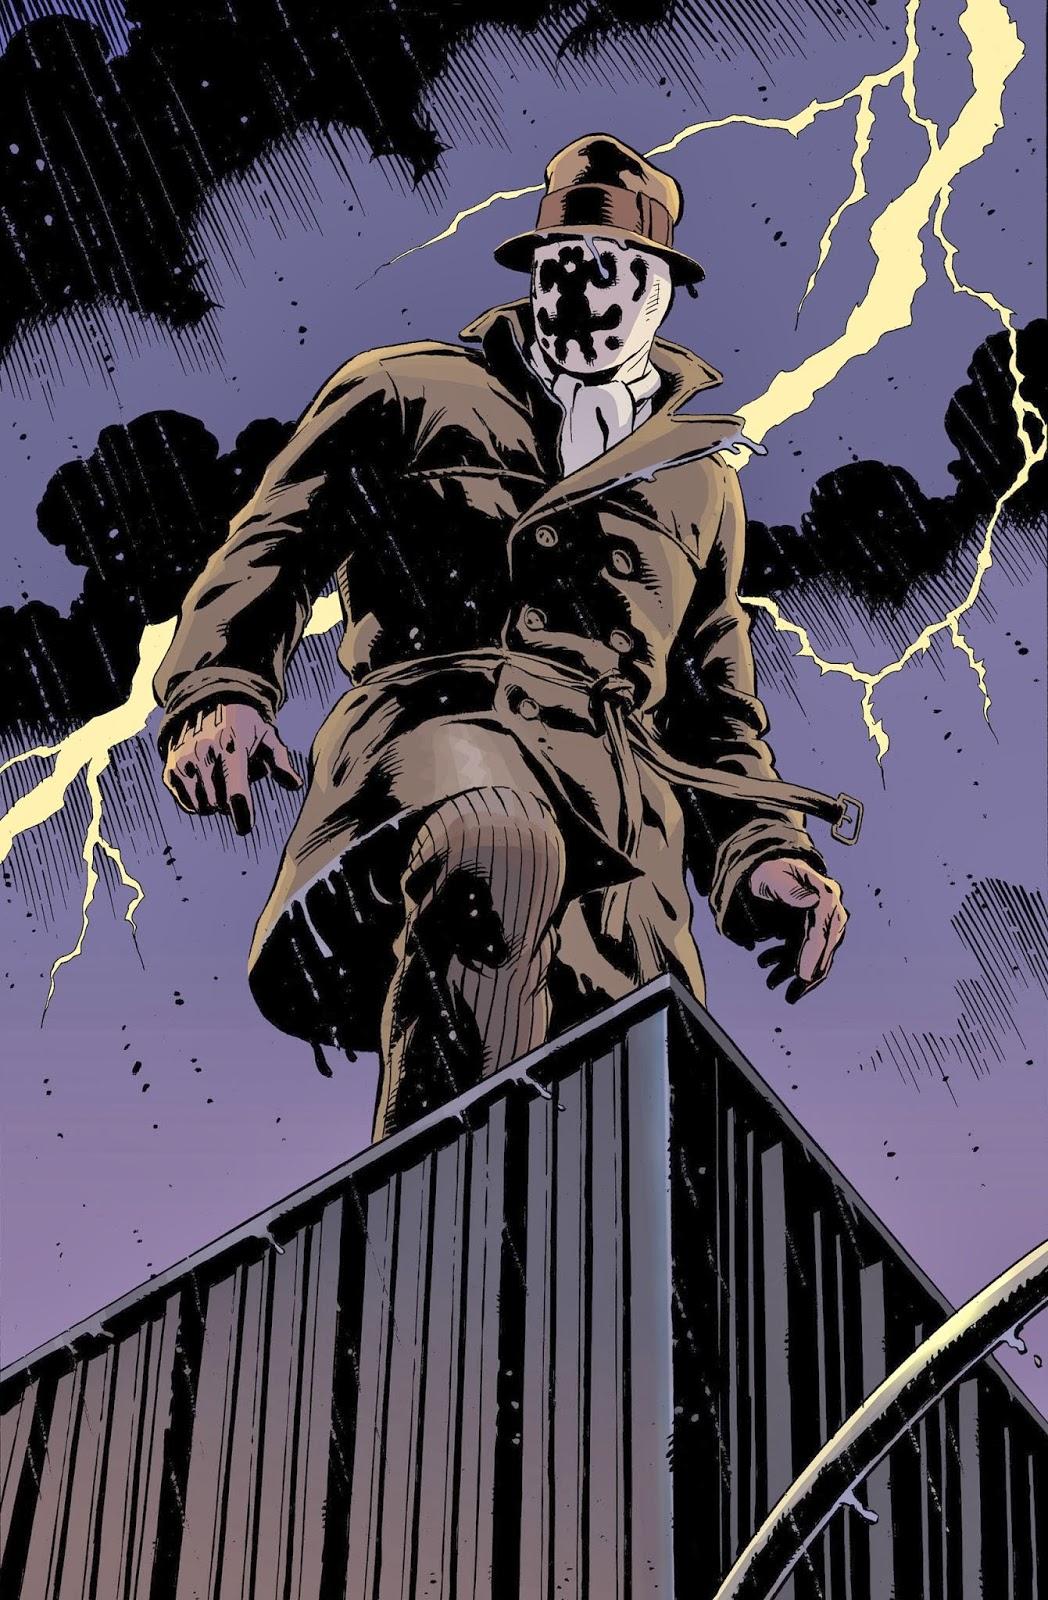 Rorschach de Watchmen